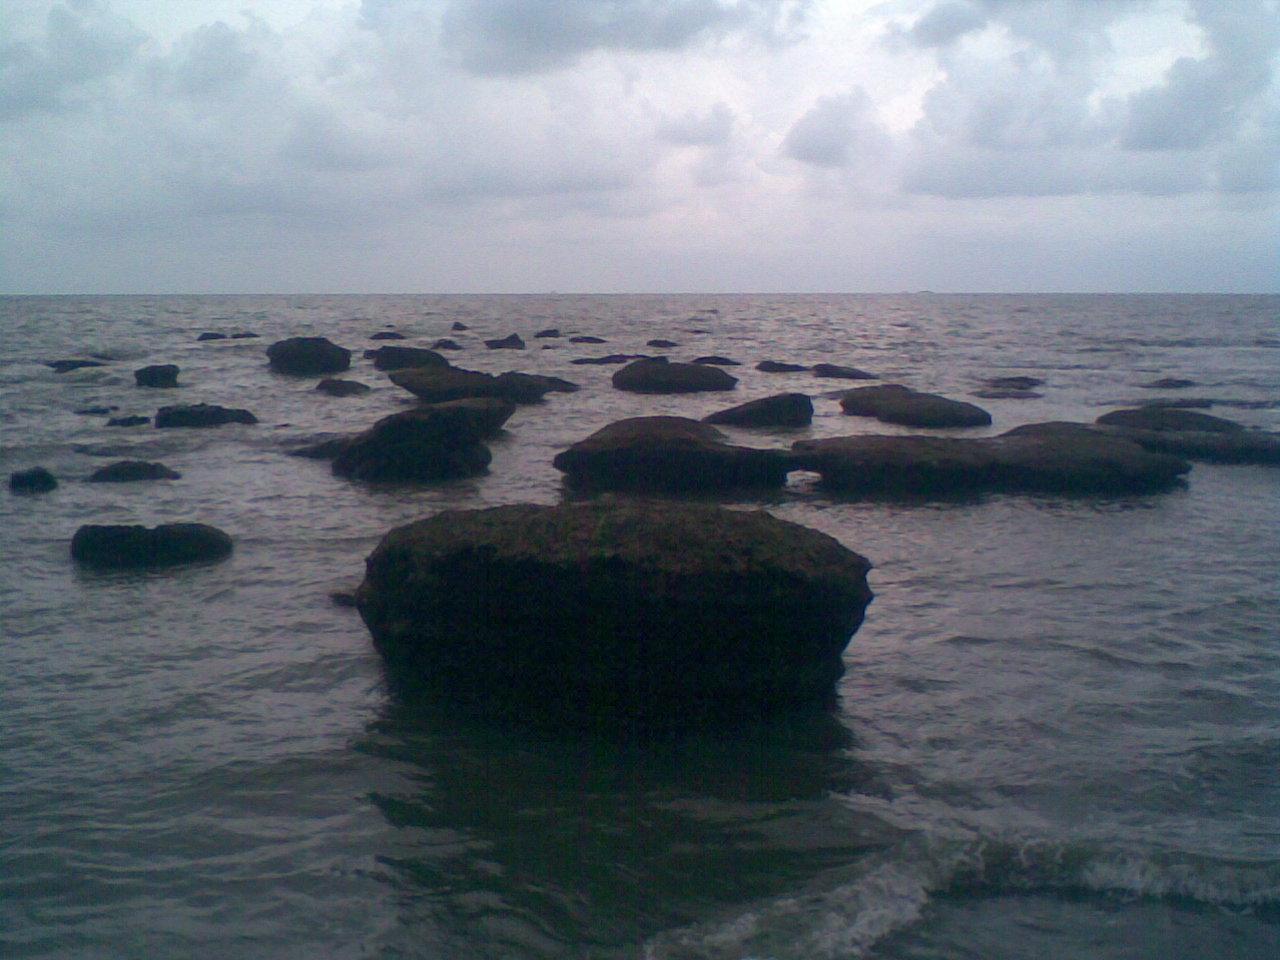 Pantai Setarap